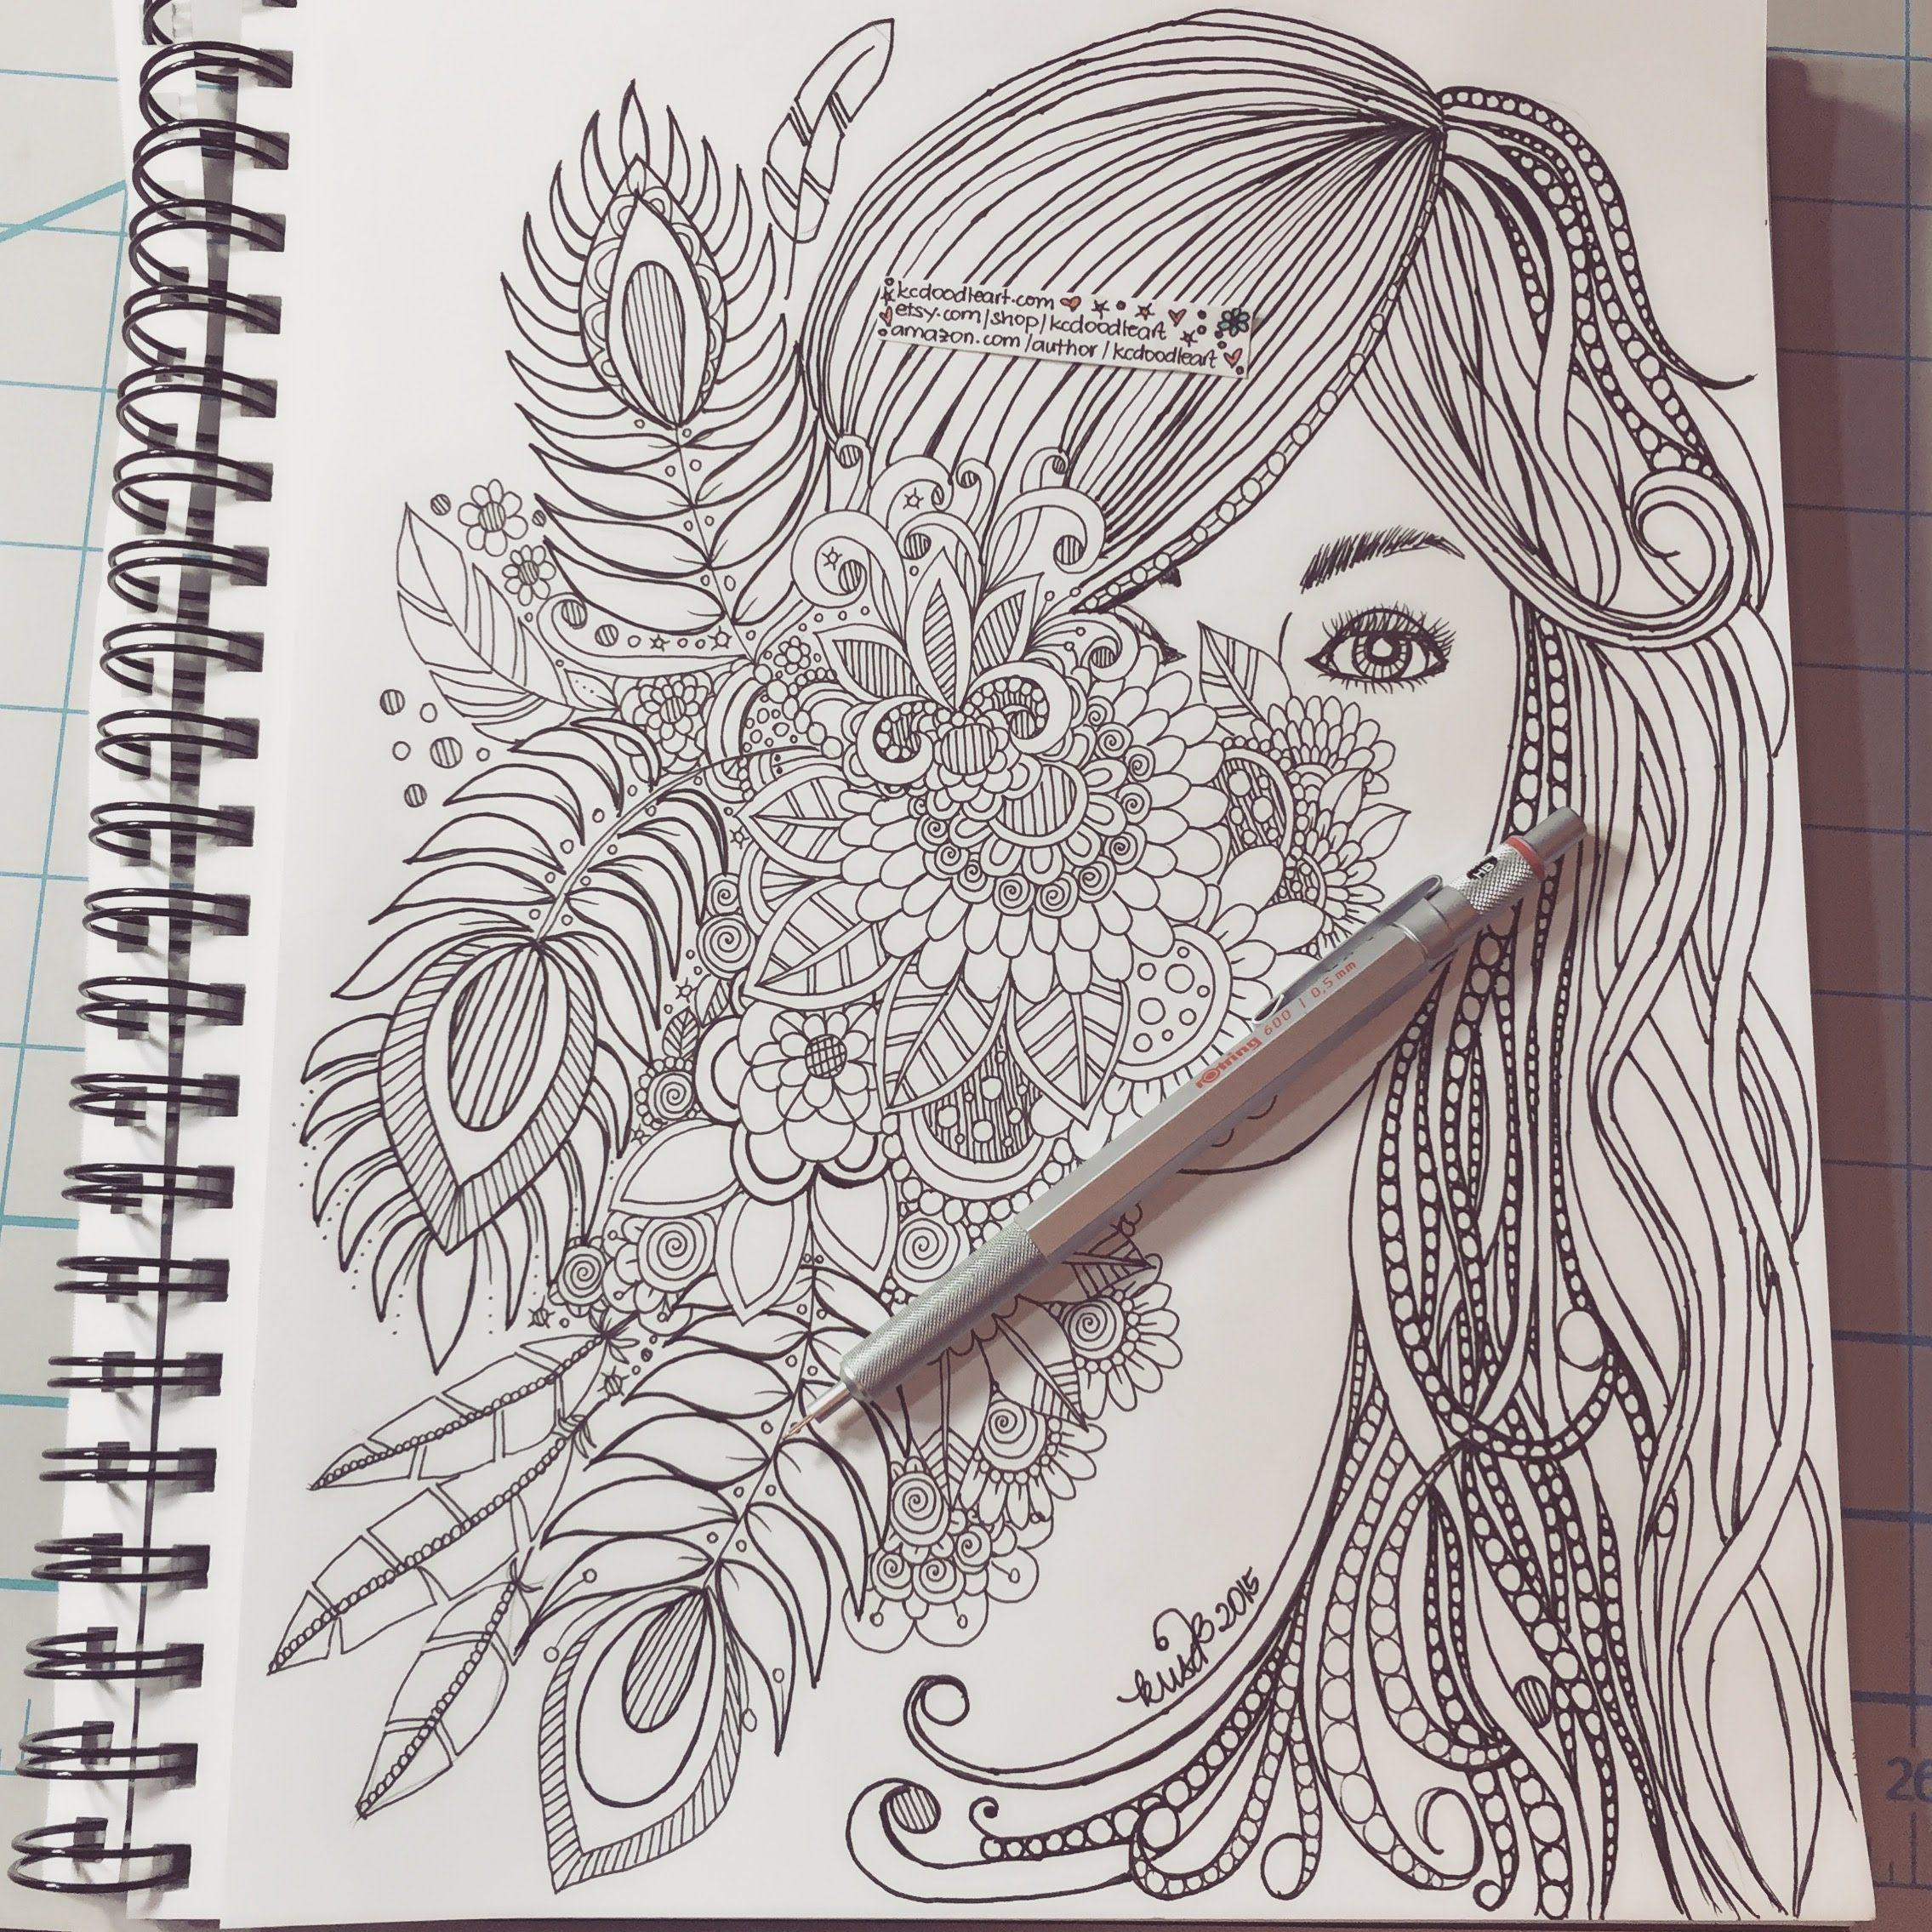 Speed Doodling Hidden Face Behind Flowers Doodle Art Designs Art Drawings Sketches Creative Mandala Design Art